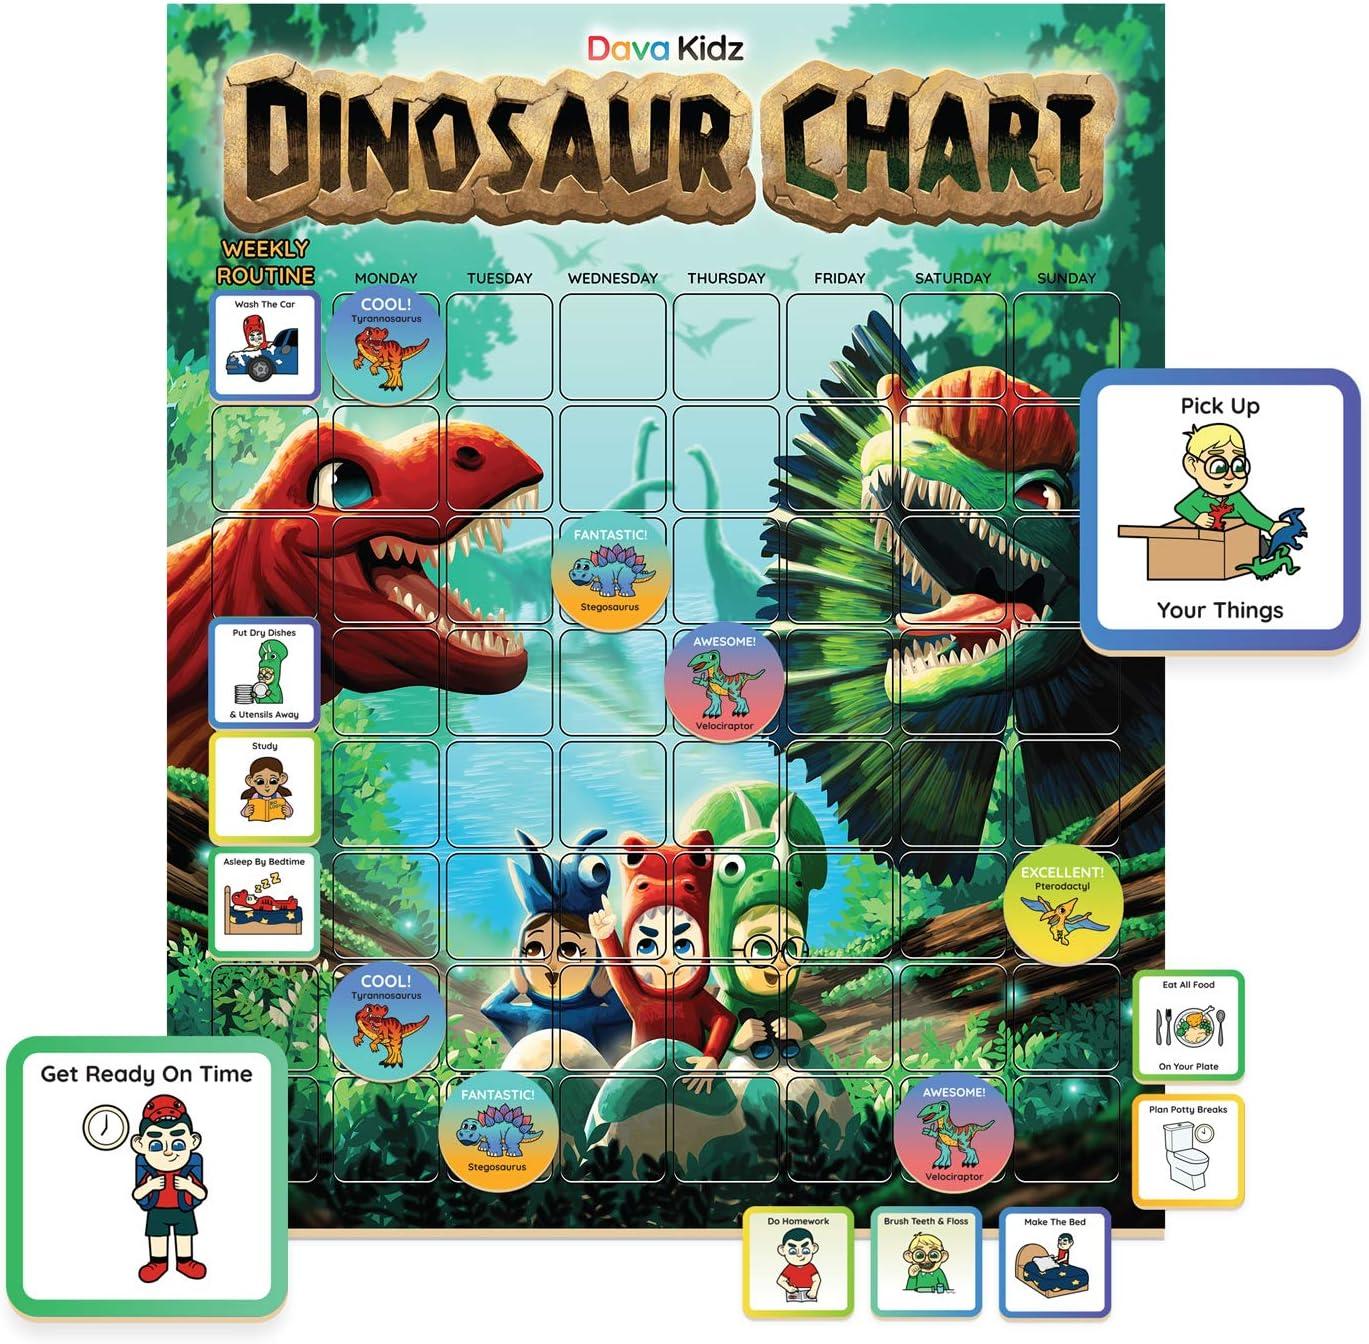 Dinosaur Chore Chart for Kids - Magnetic Reward Chart to Spark New Routines & Responsibility at Home - Behavior Chart to Raise Star Children Boys & Girls - Task & Reward Magnets